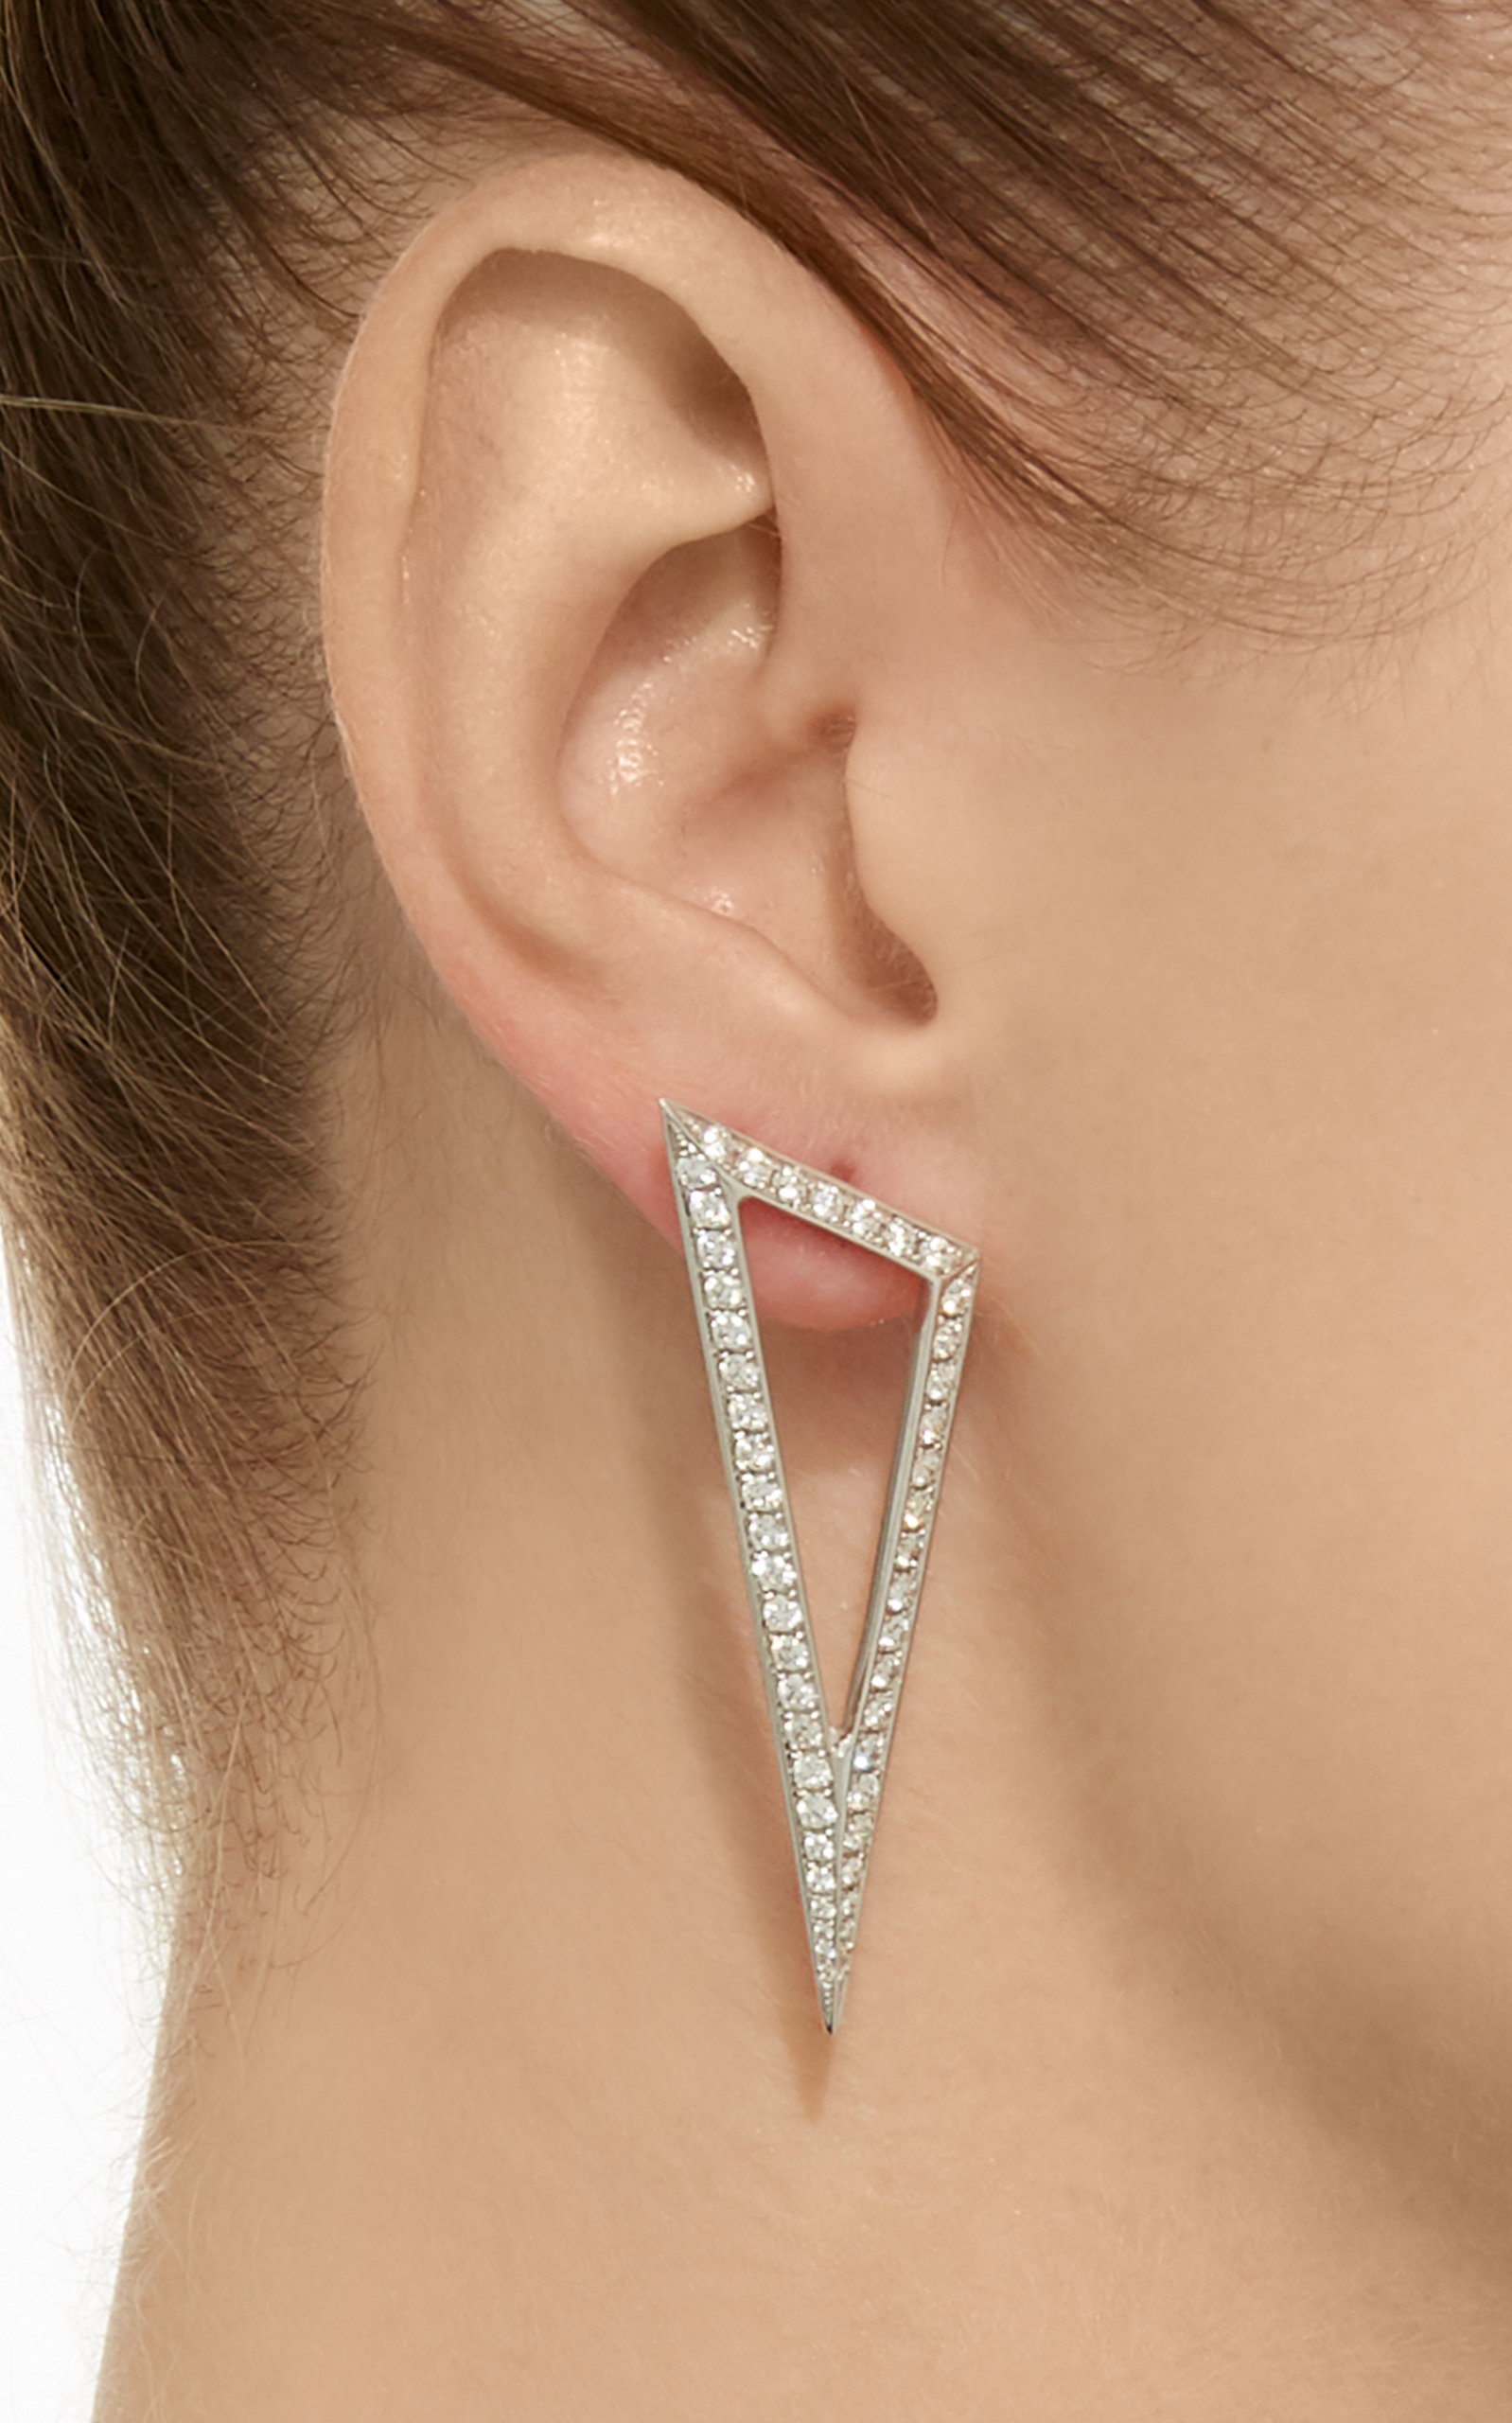 5a997f257 Daimond Triangle Earrings by Ralph Masri | Moda Operandi